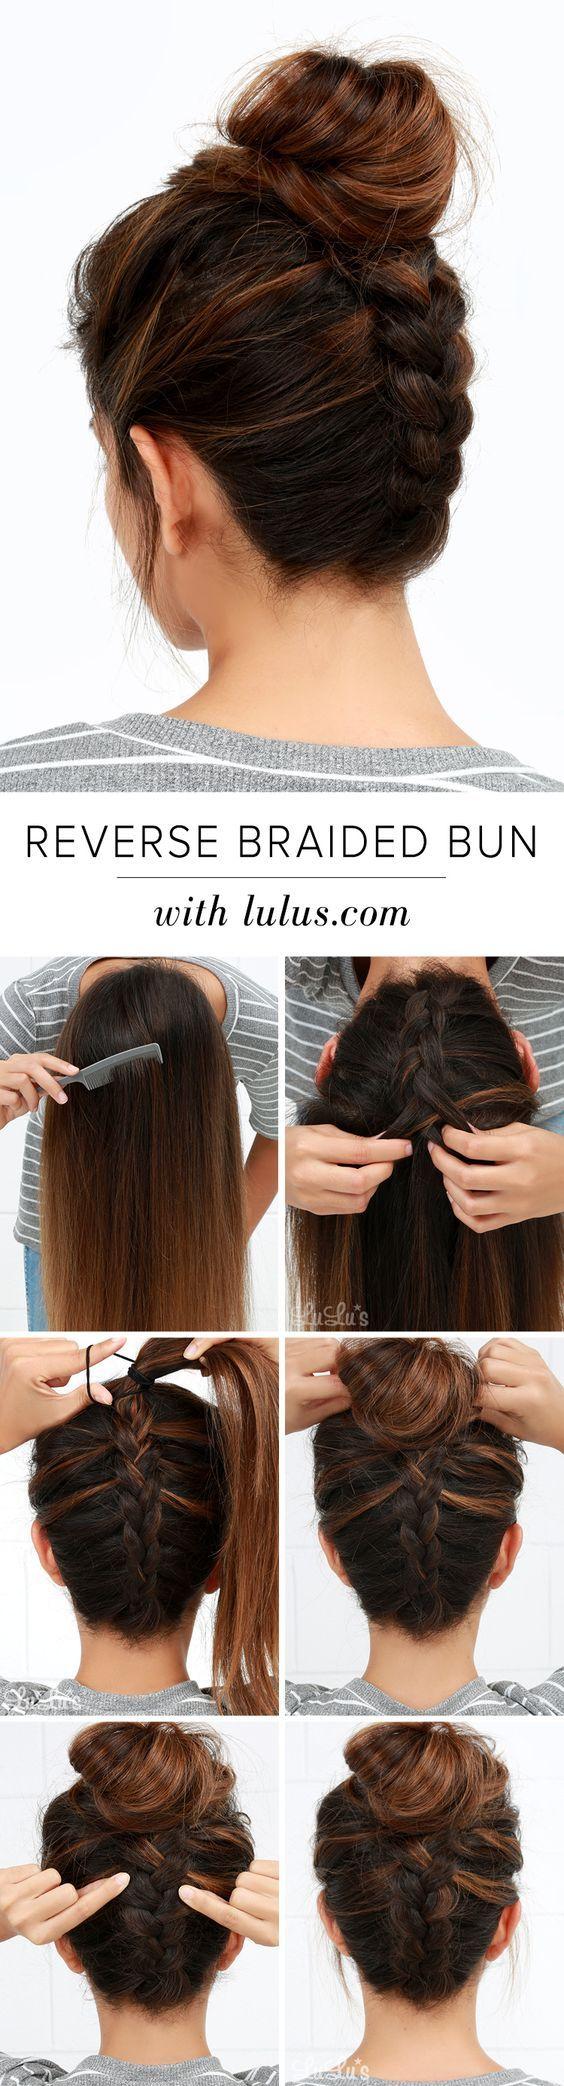 Best 25+ Short braided hairstyles ideas on Pinterest | Braids for ...